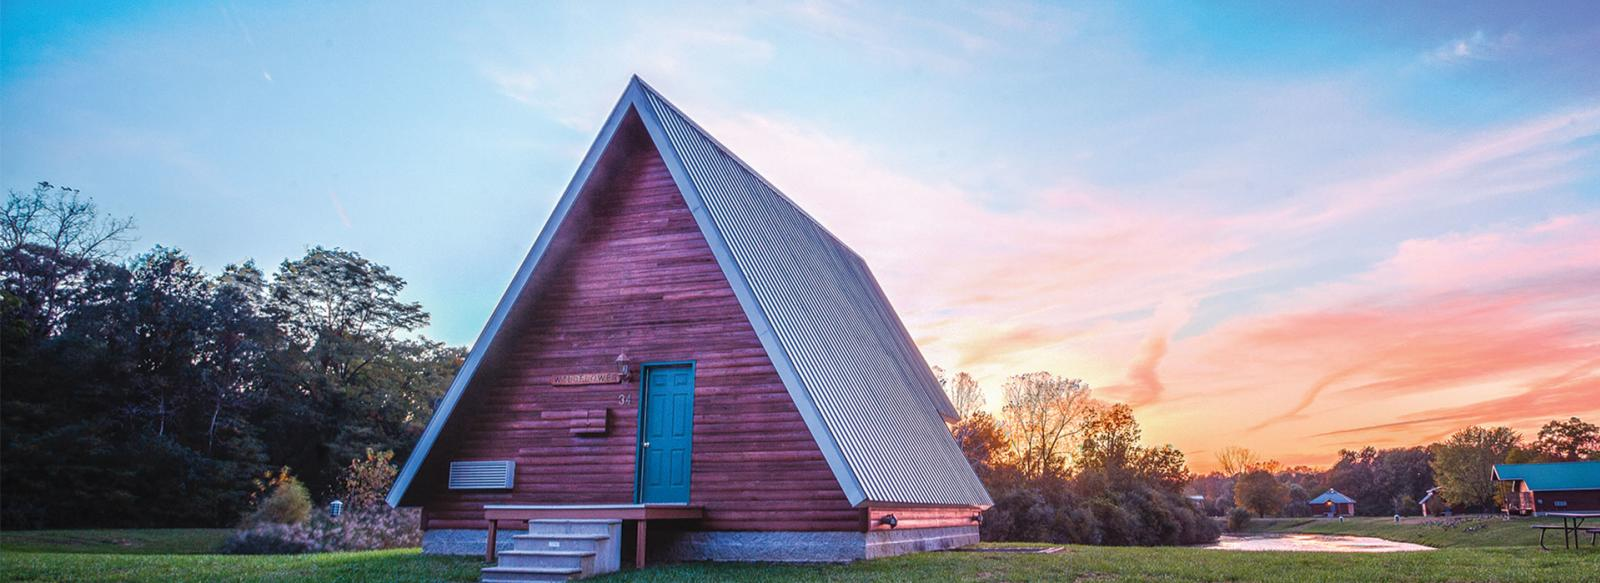 Serenity Springs Cabin - Romantic Getaways Northwest Indiana